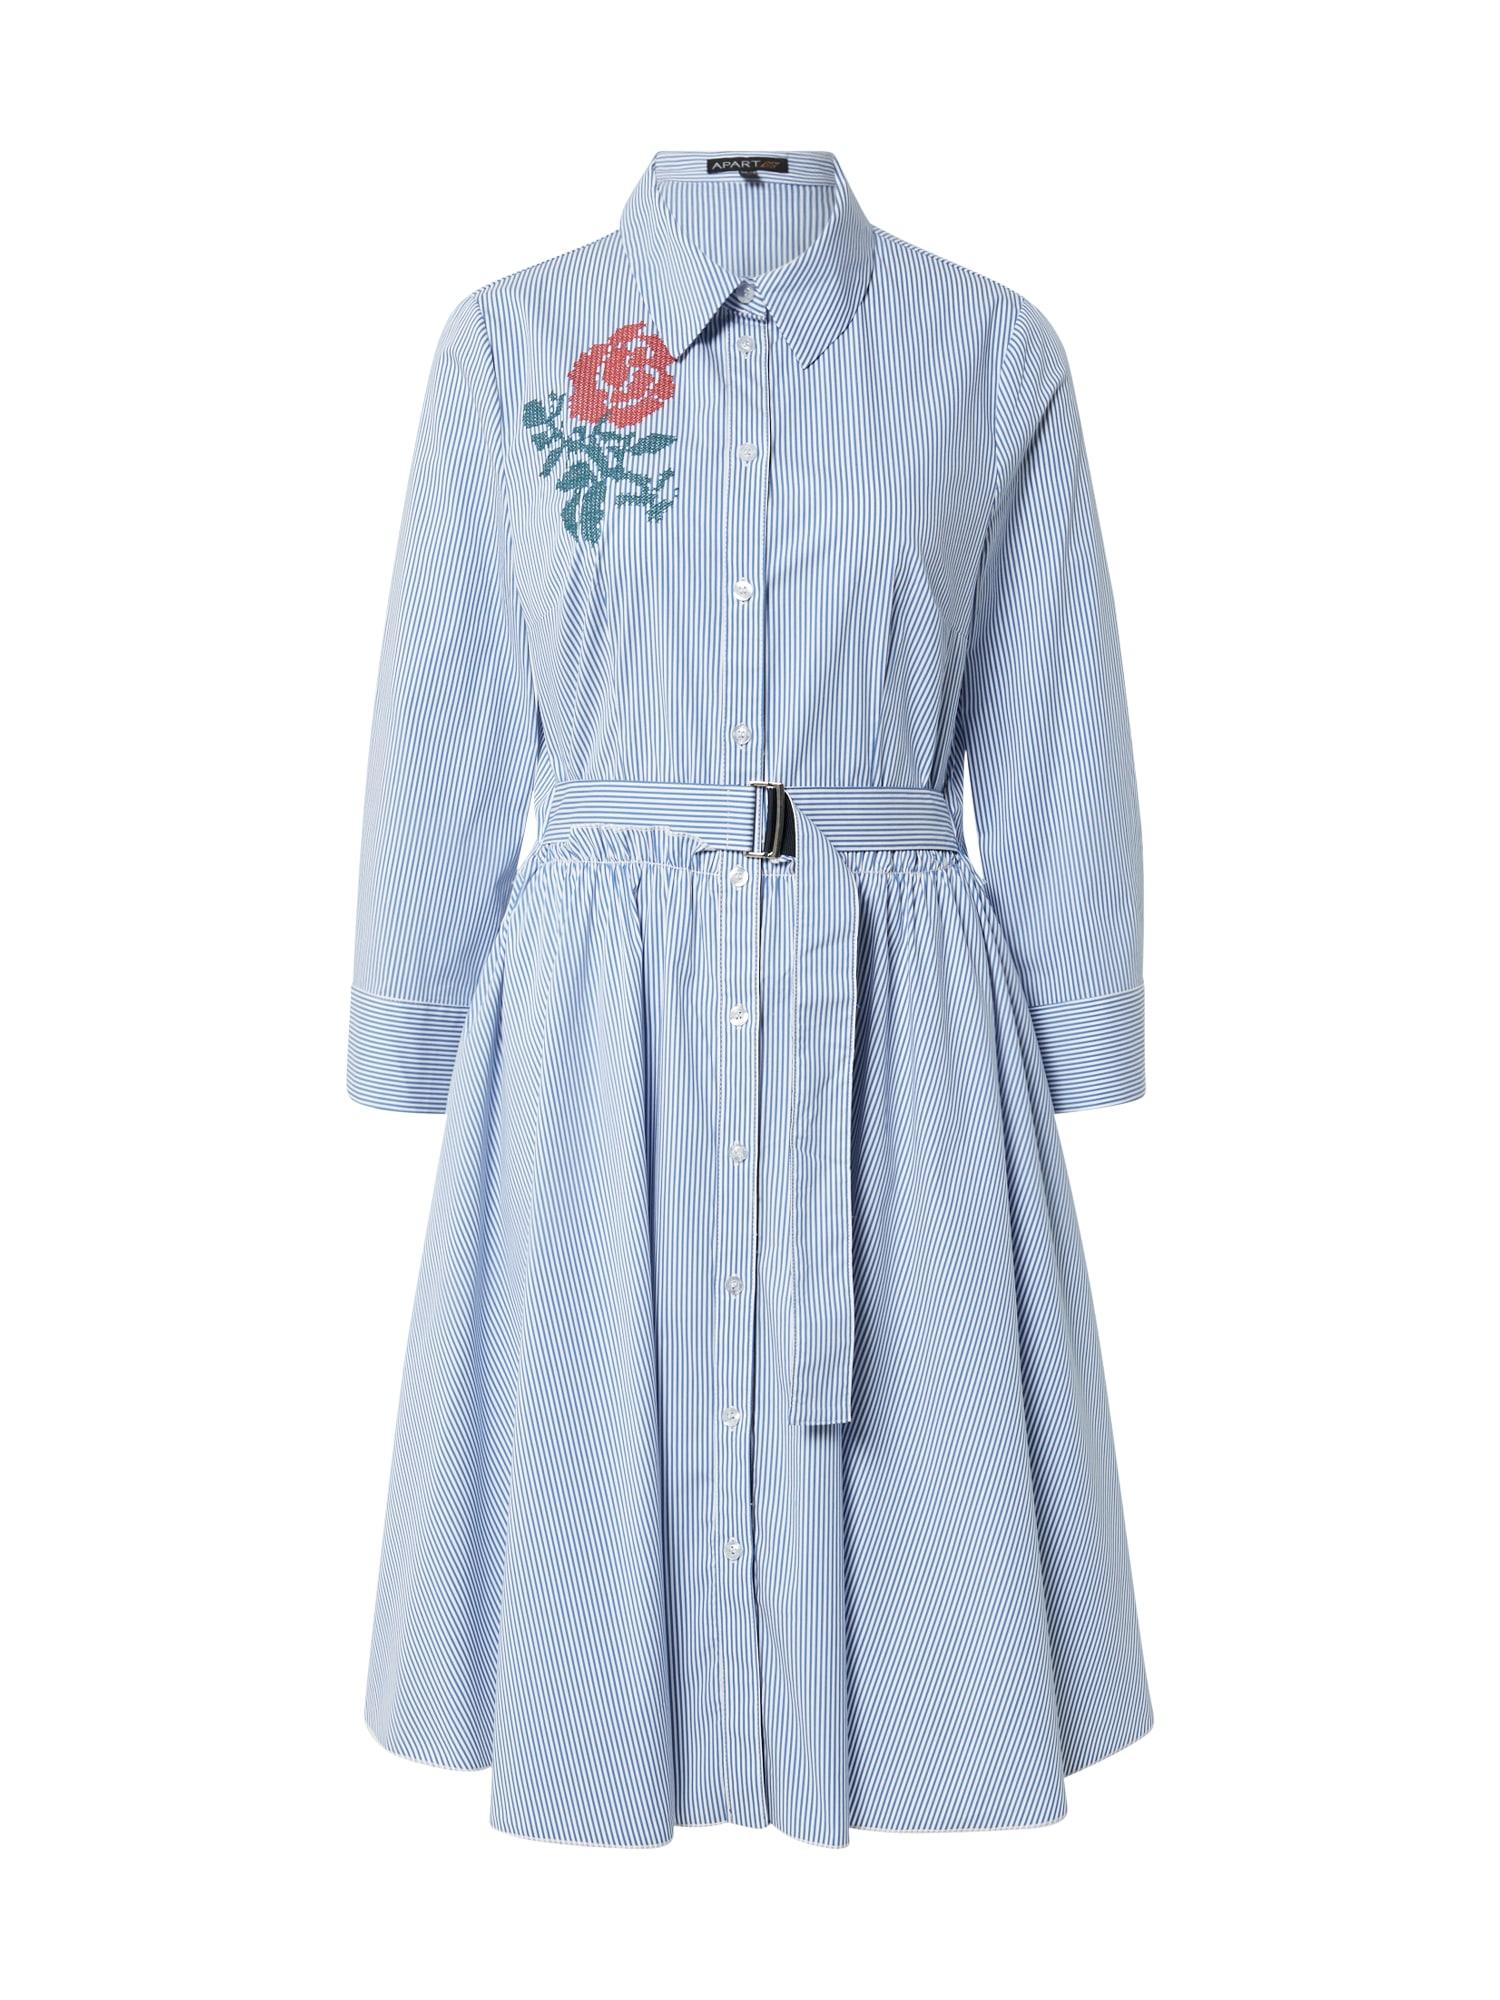 APART Suknelė mėlyna / balta